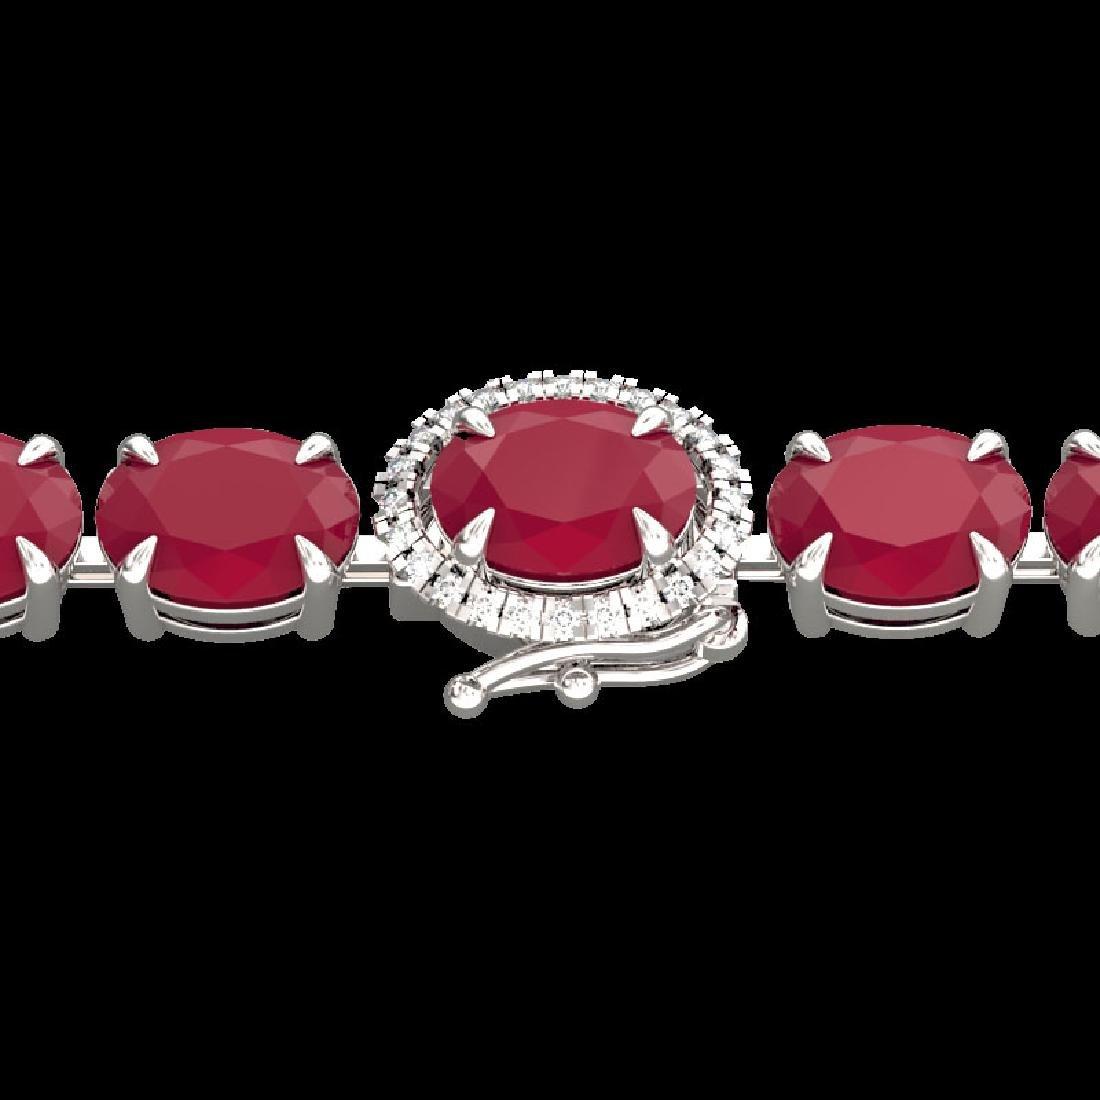 37 CTW Ruby & VS/SI Diamond Eternity Tennis Micro Halo